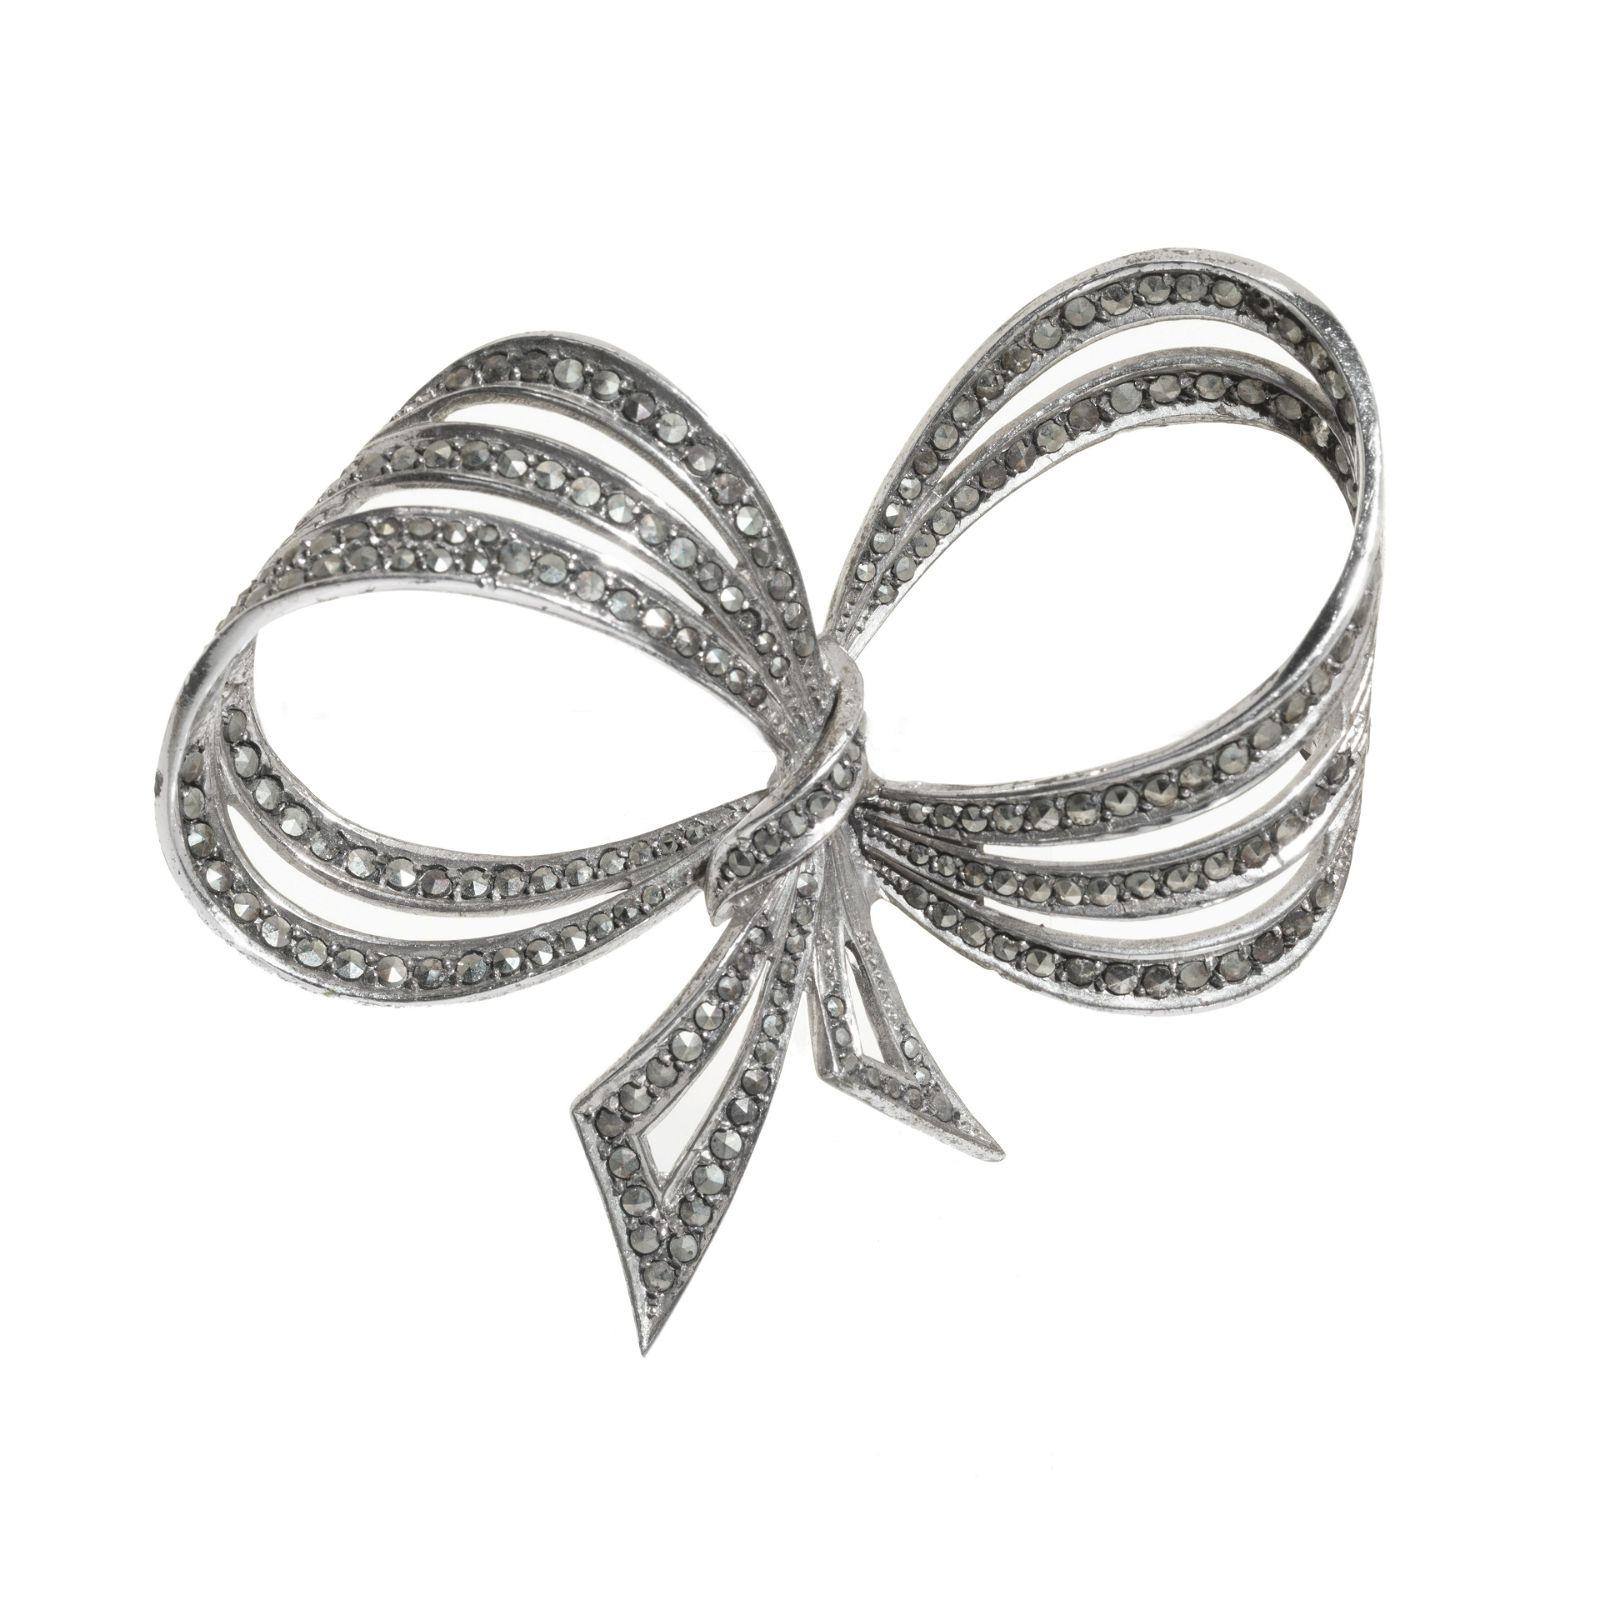 VIVIEN LEIGH. Three-turn bow brooch, 1950s. Silver